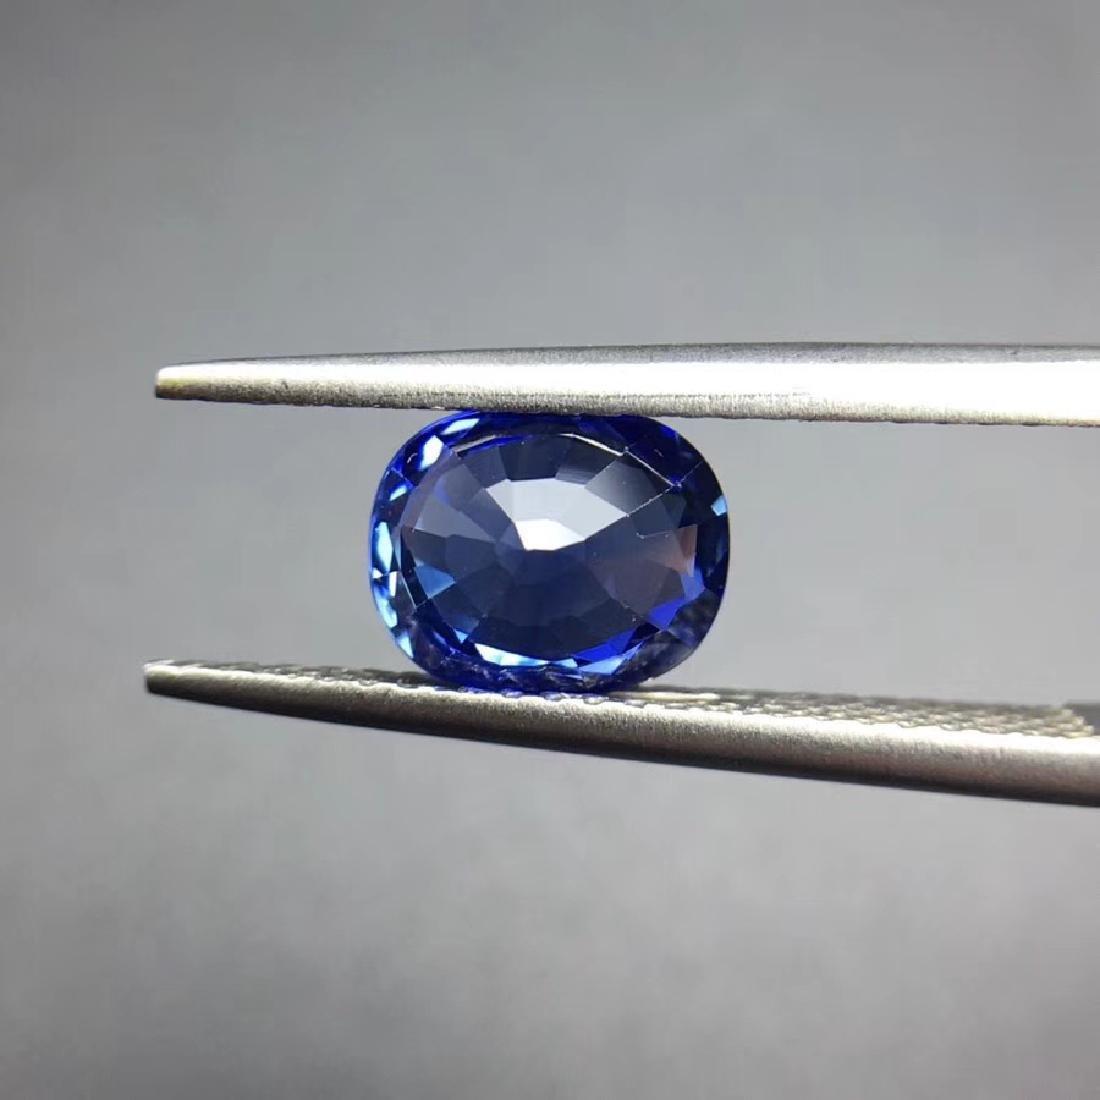 1.85 ct Sapphire 7.4*6.0*4.4 mm Oval Cut - 4